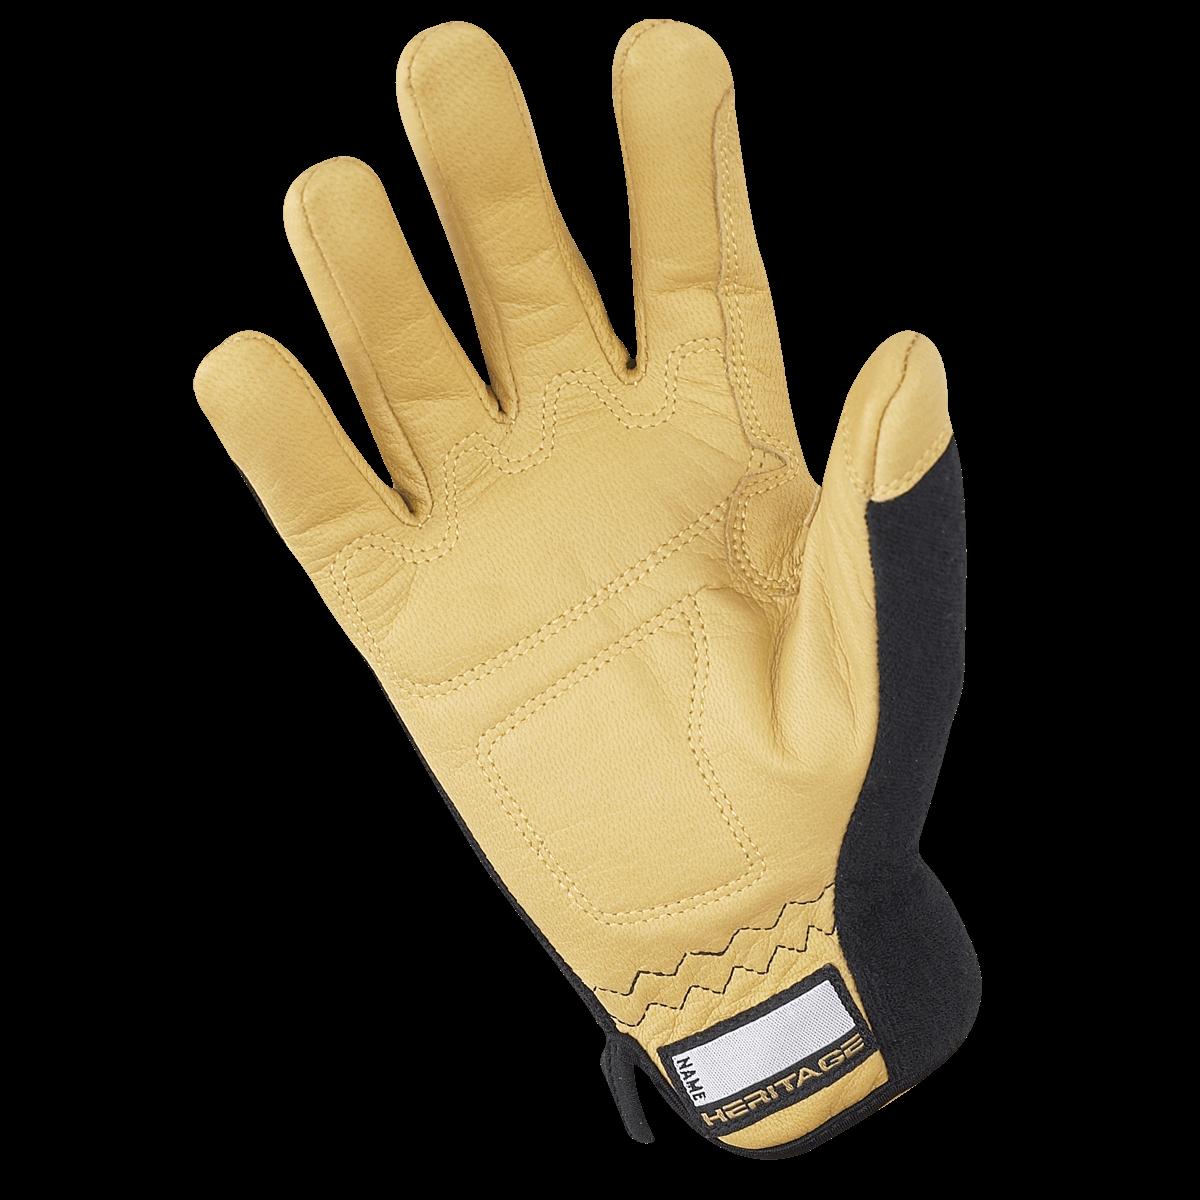 Heritage Heritage Stable Work Glove - Black/Tan